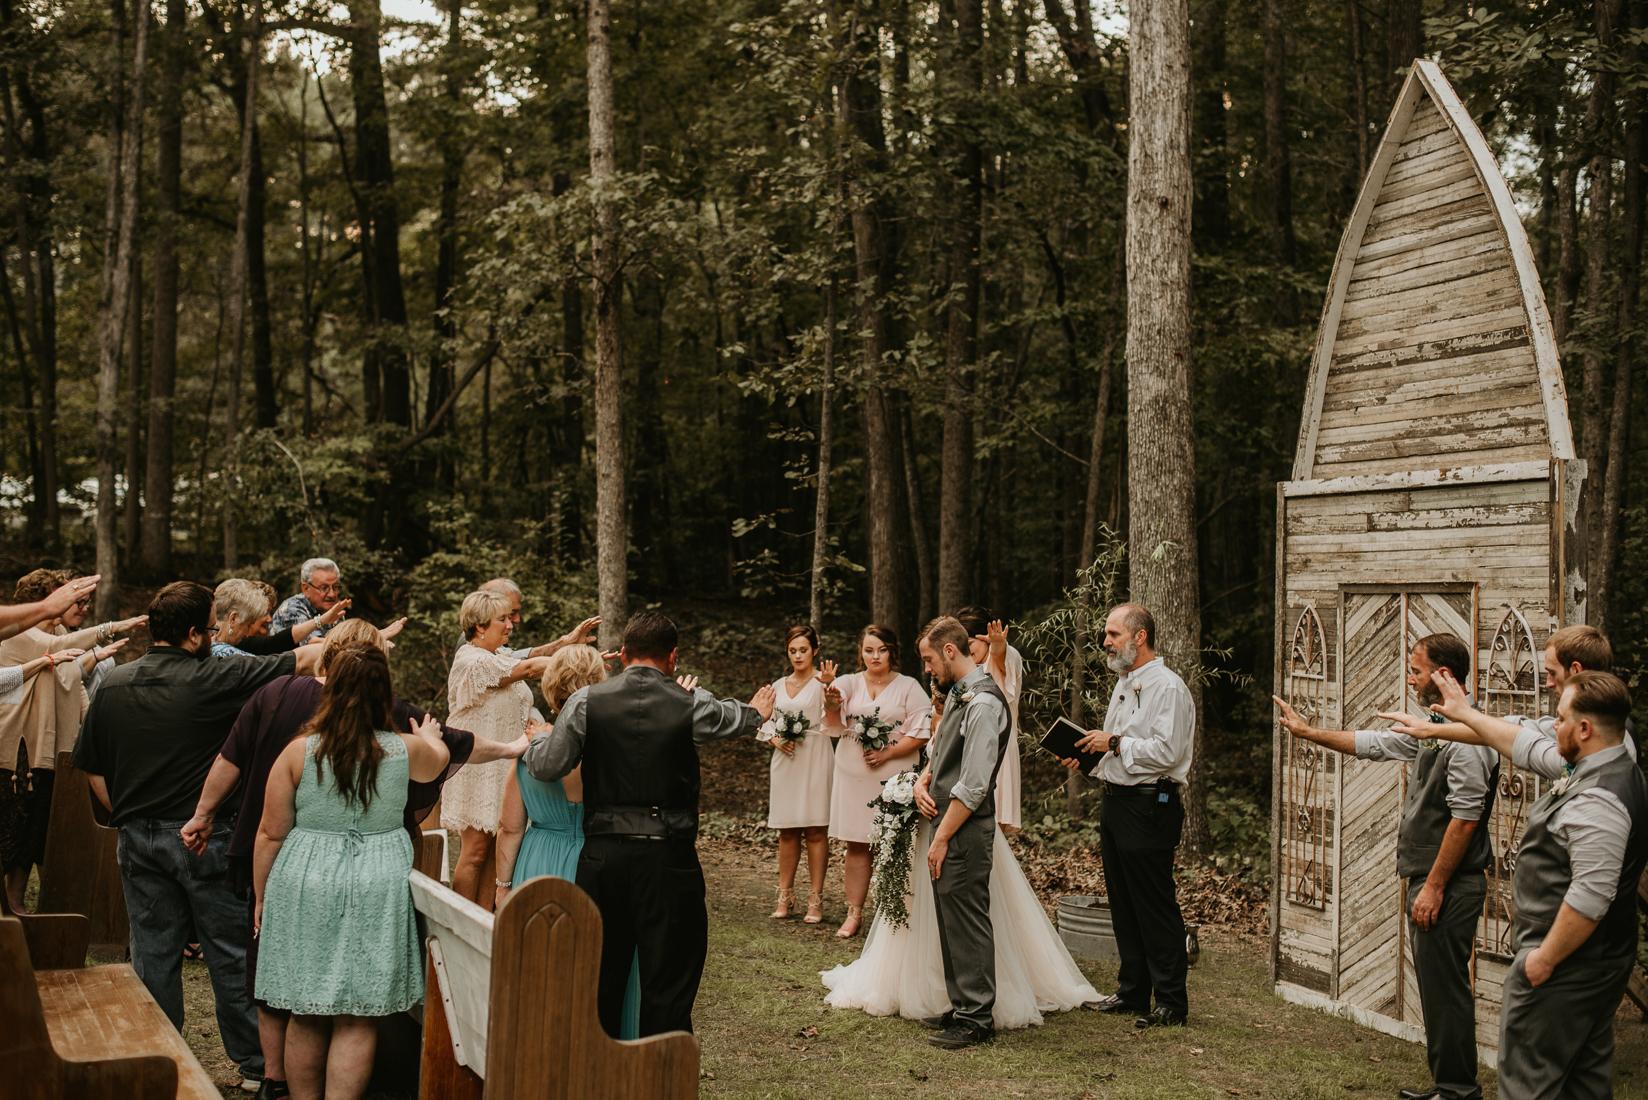 olivia_zay_wedding_09_2018-0663.jpg